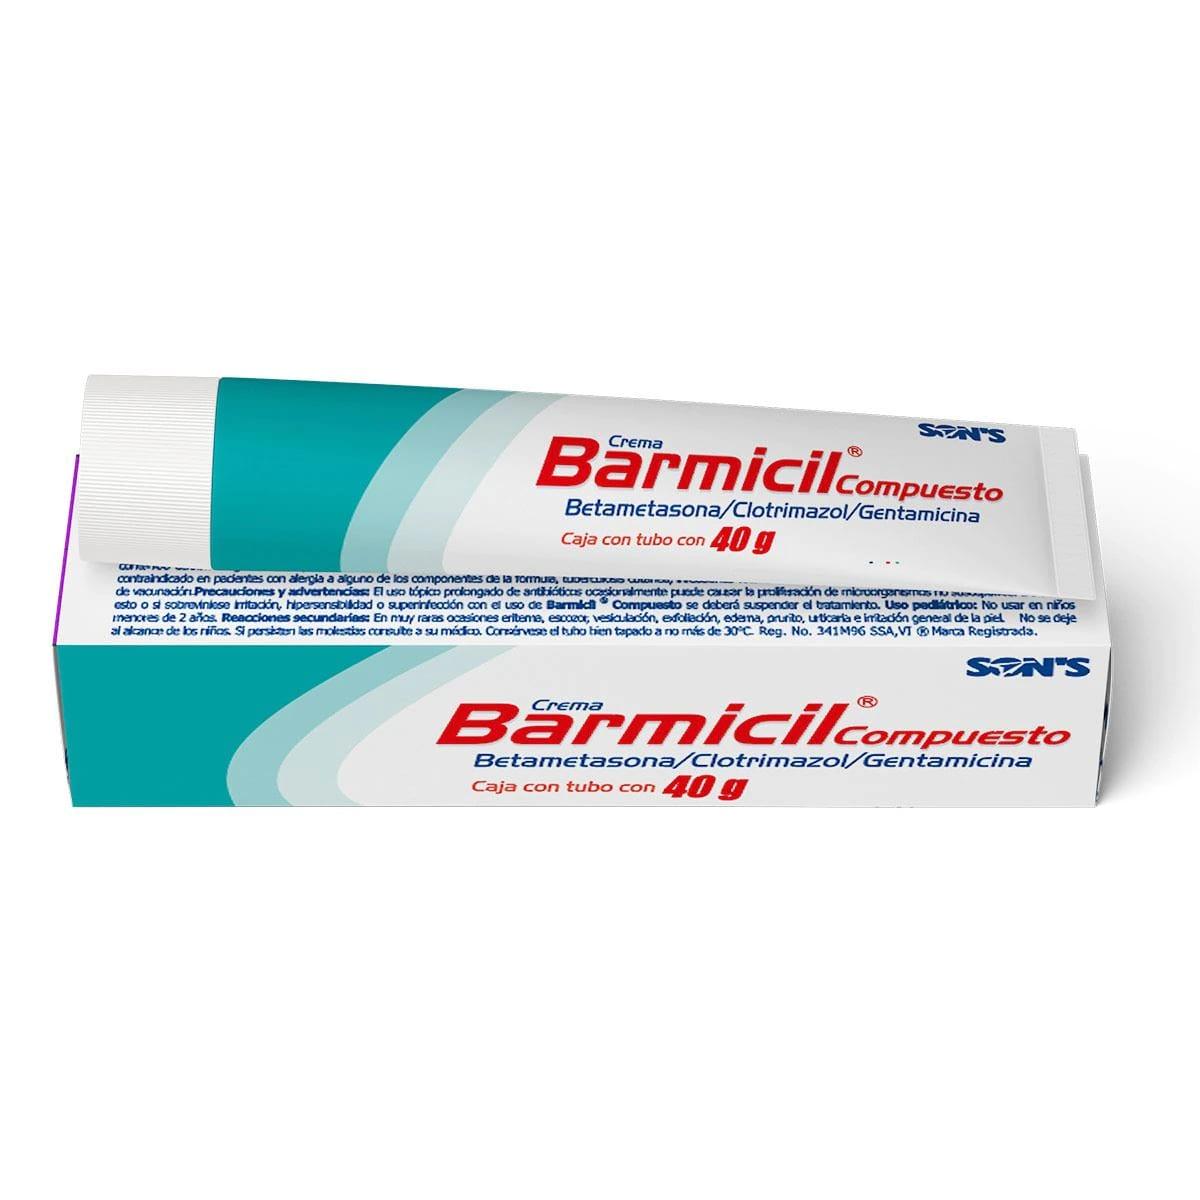 Comprar Barmicil 50 Mg 1 Tubo Crema 40 Gr